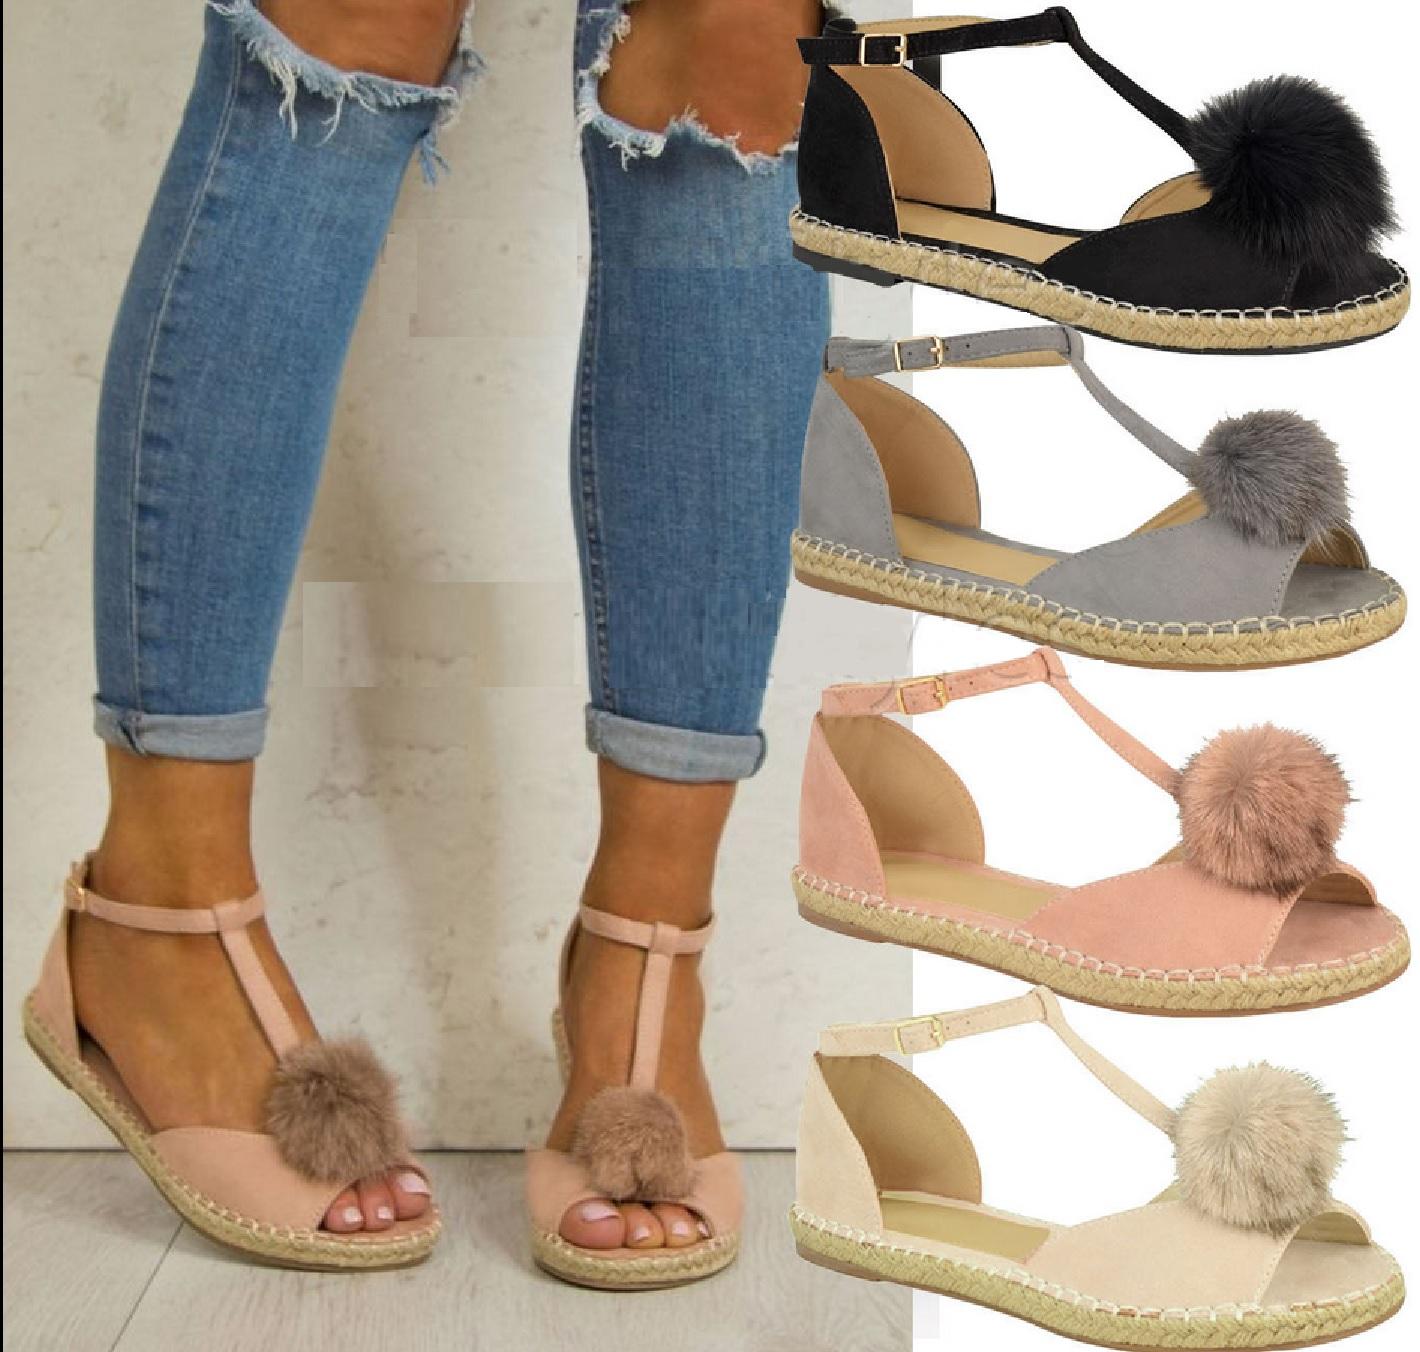 Womens sandals ebay - Womens Ladies Flat Peeptoe Pom Pom T Bar Espadrilles Pumps Sandals Shoes Sz 3